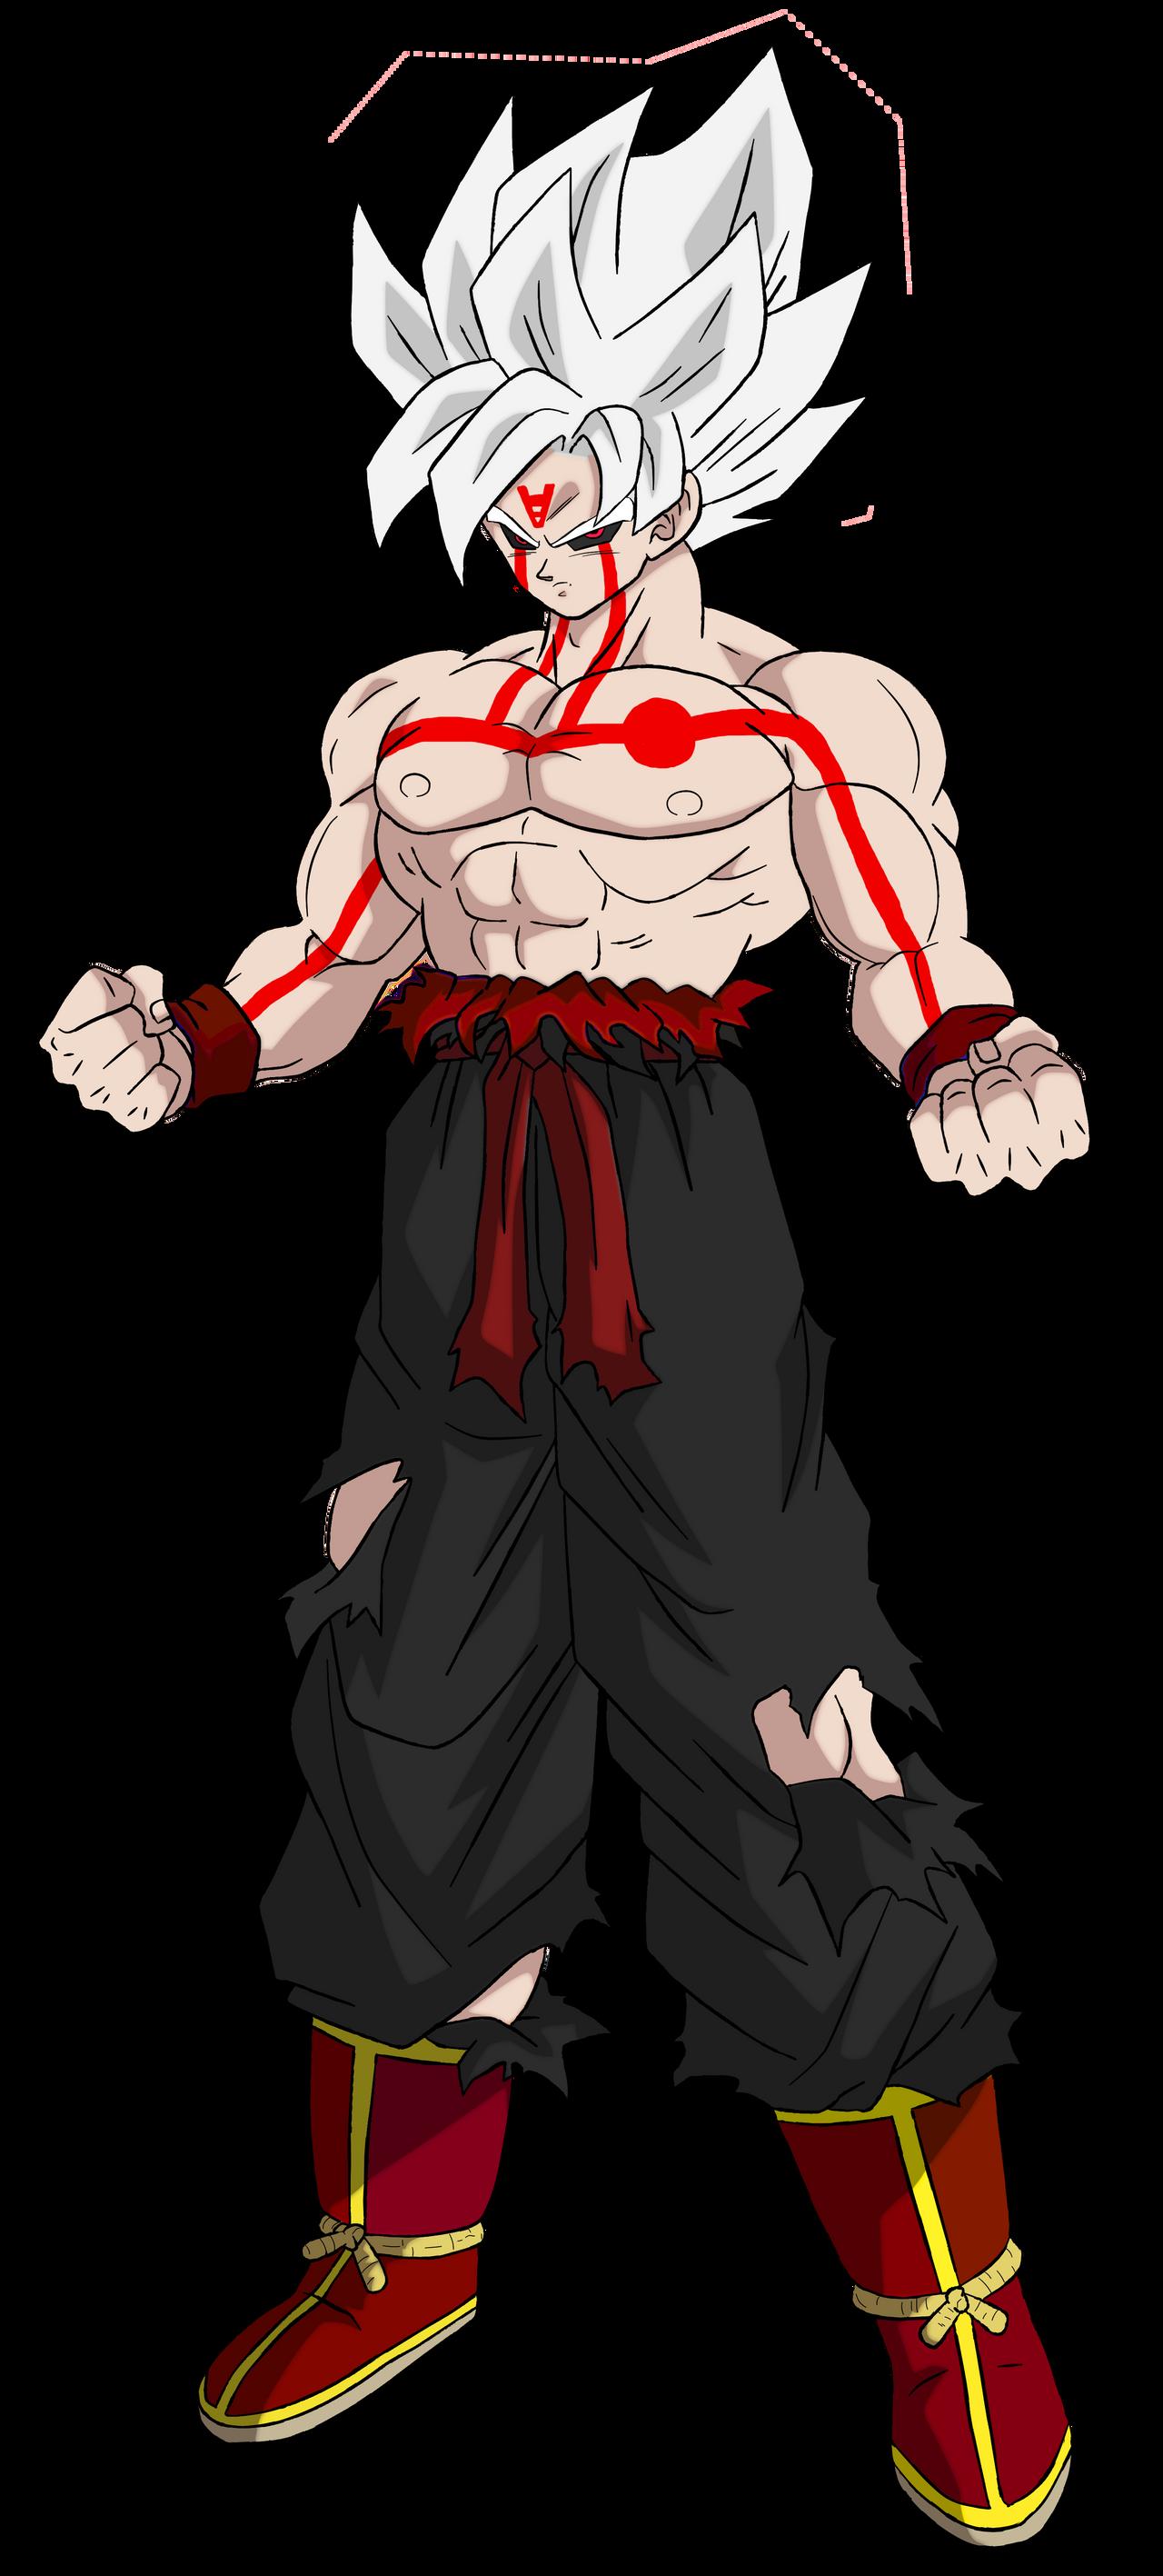 Evil Goku Super Saiyajin Omni Dios By Evilgokkucrack577 On Deviantart In 2021 Dragon Ball Super Artwork Anime Dragon Ball Super Dragon Ball Super Manga